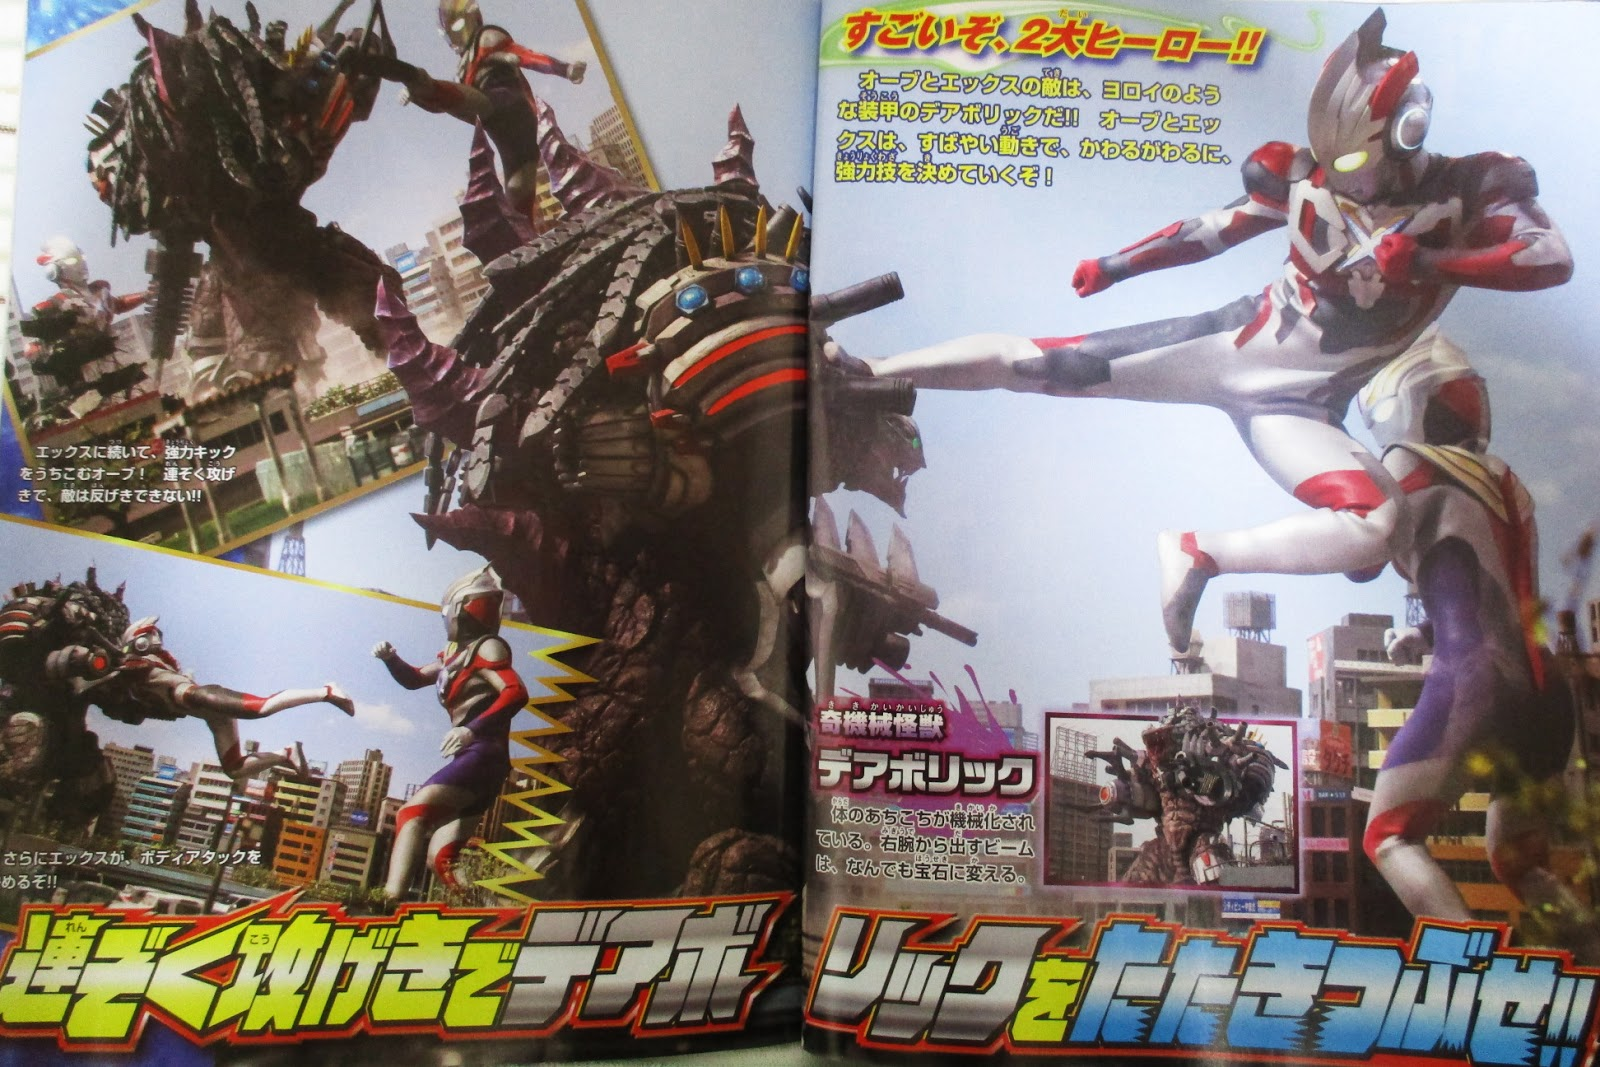 Bandai Ultra Hero Orb 06 Ultraman Trinity Daftar Harga Terkini 0479479 Shf Act Origin 15163 And His Fellow Heroes Will Fight Against Diabolic Sadeath The New Villains